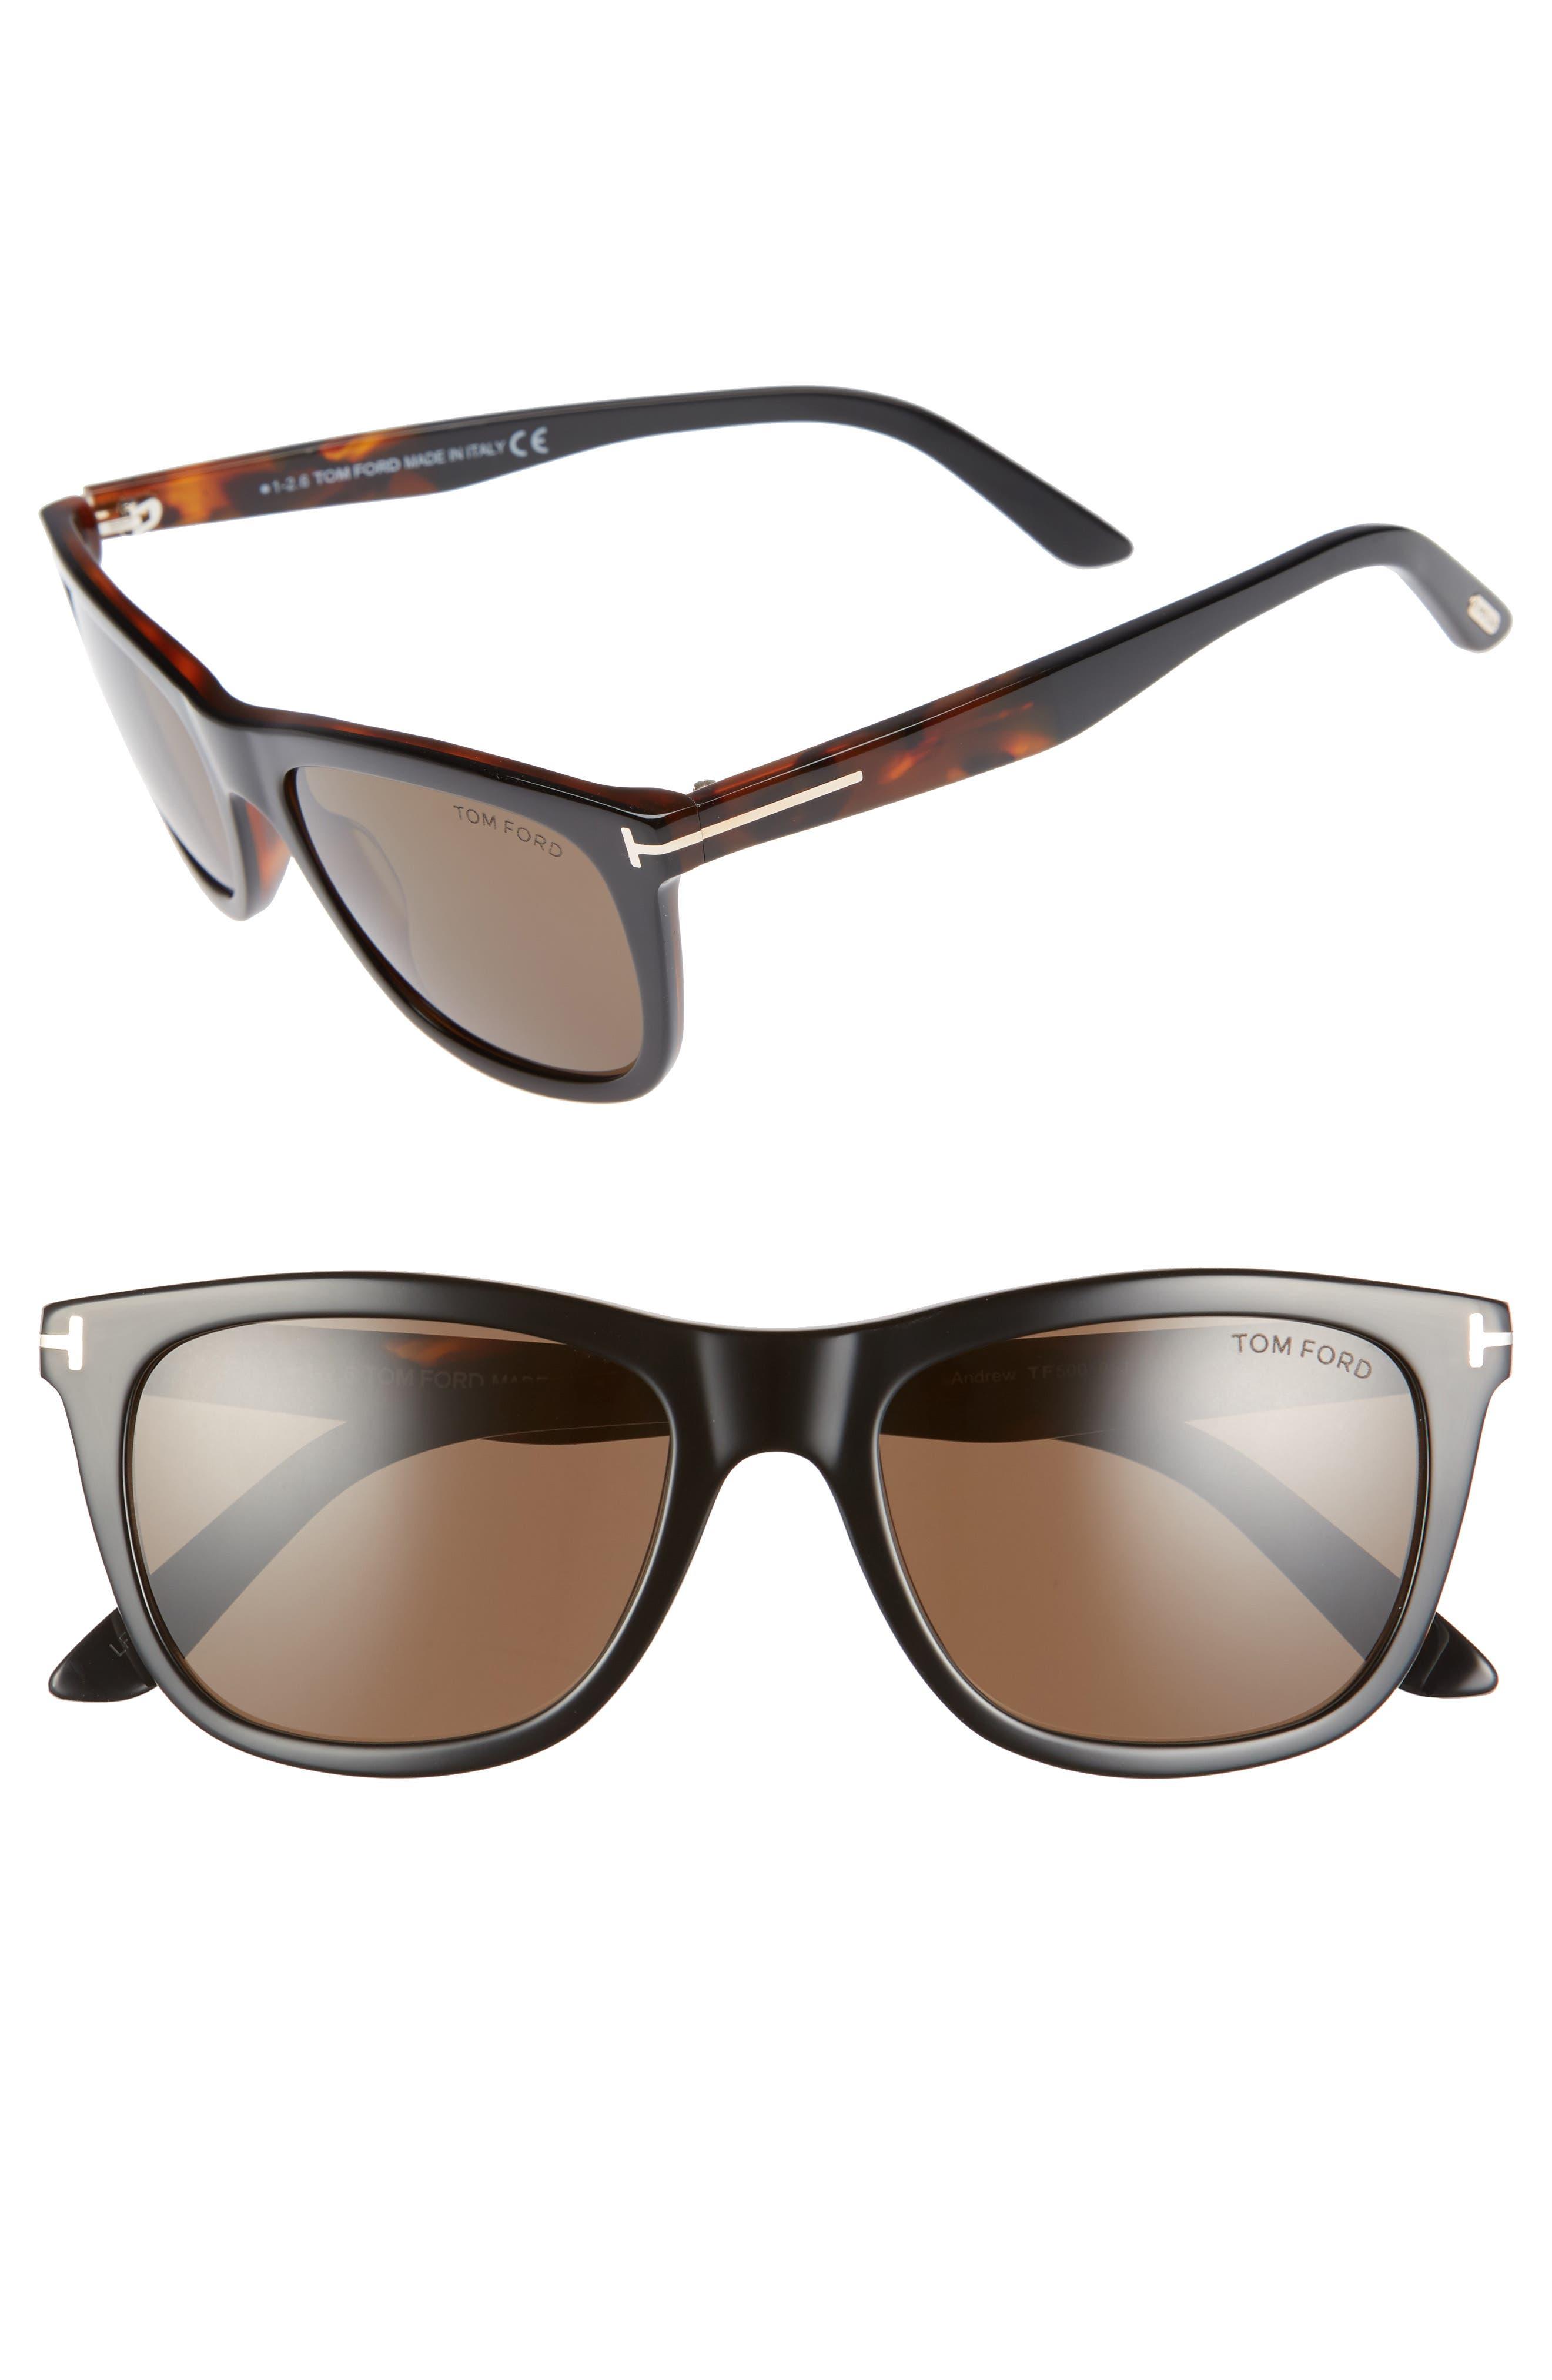 Andrew 54mm Polarized Sunglasses,                             Main thumbnail 1, color,                             BLACK/ HAVANA